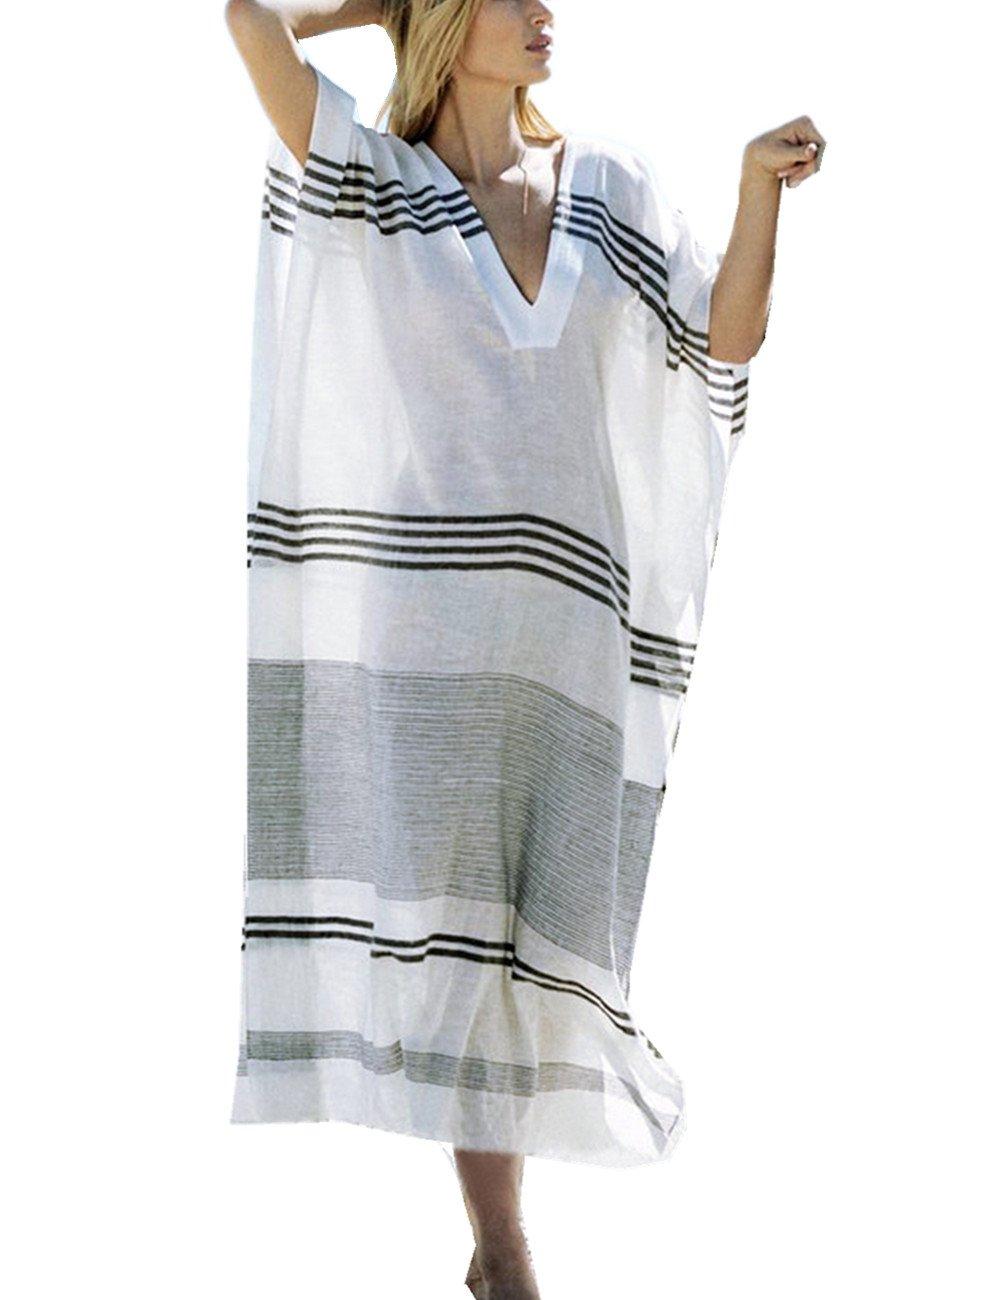 L-Peach Women's Summer Fashion V Neck Stripe Printed Loose Long Kaftan Bikini Cover Up Elegant Beach Dress One Size